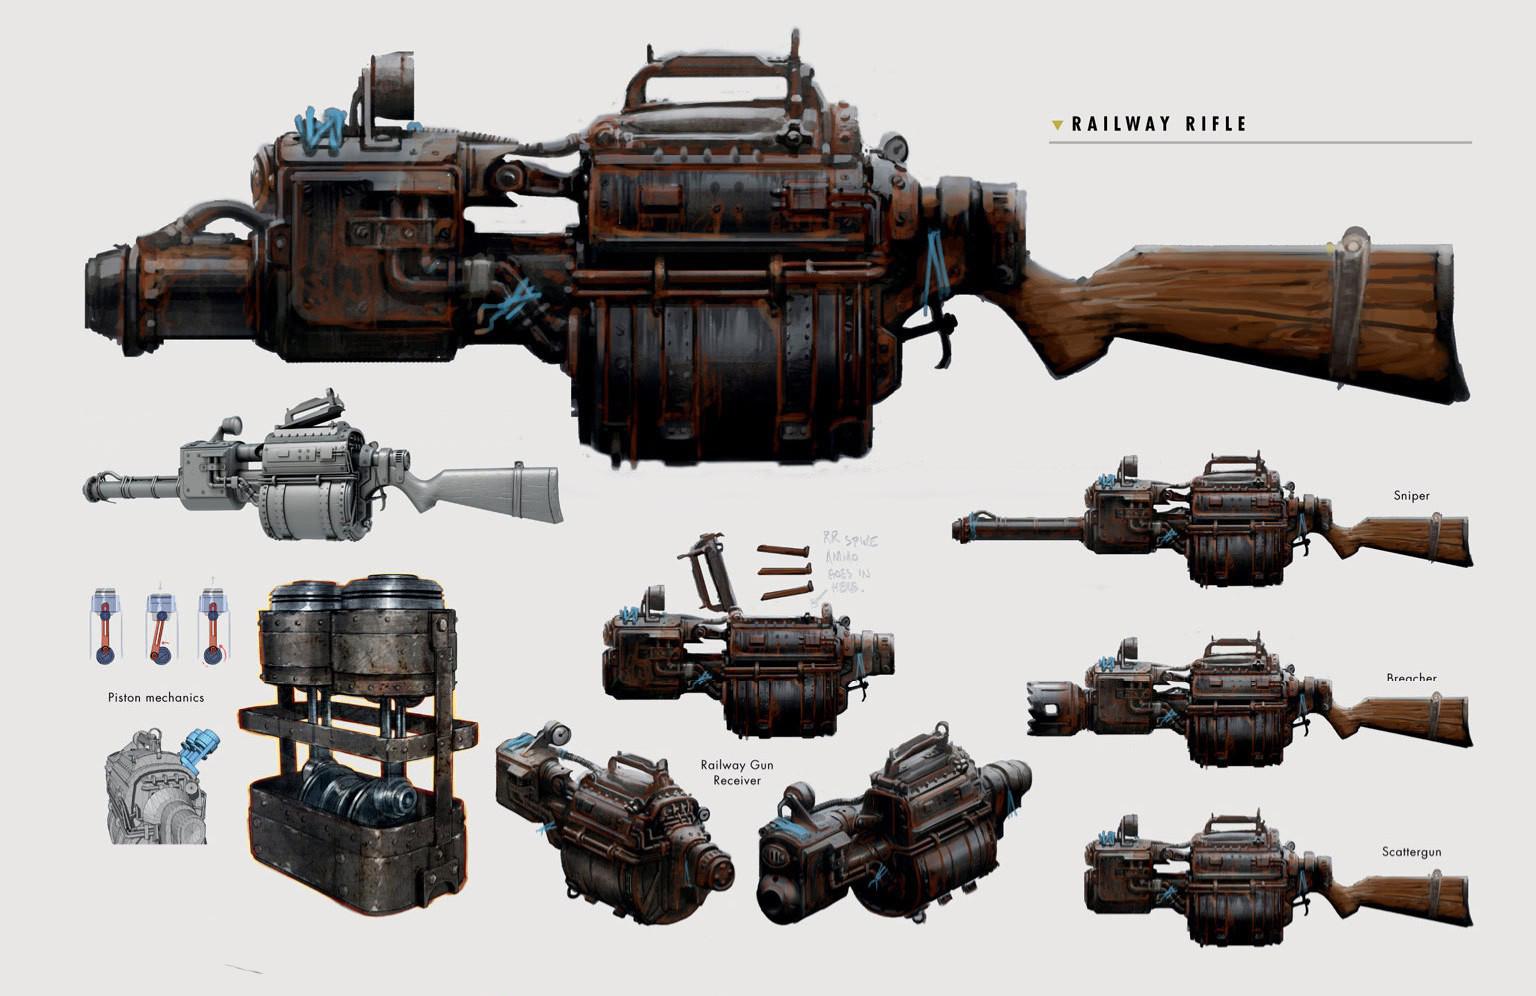 Art of FO4 Railway Rifle